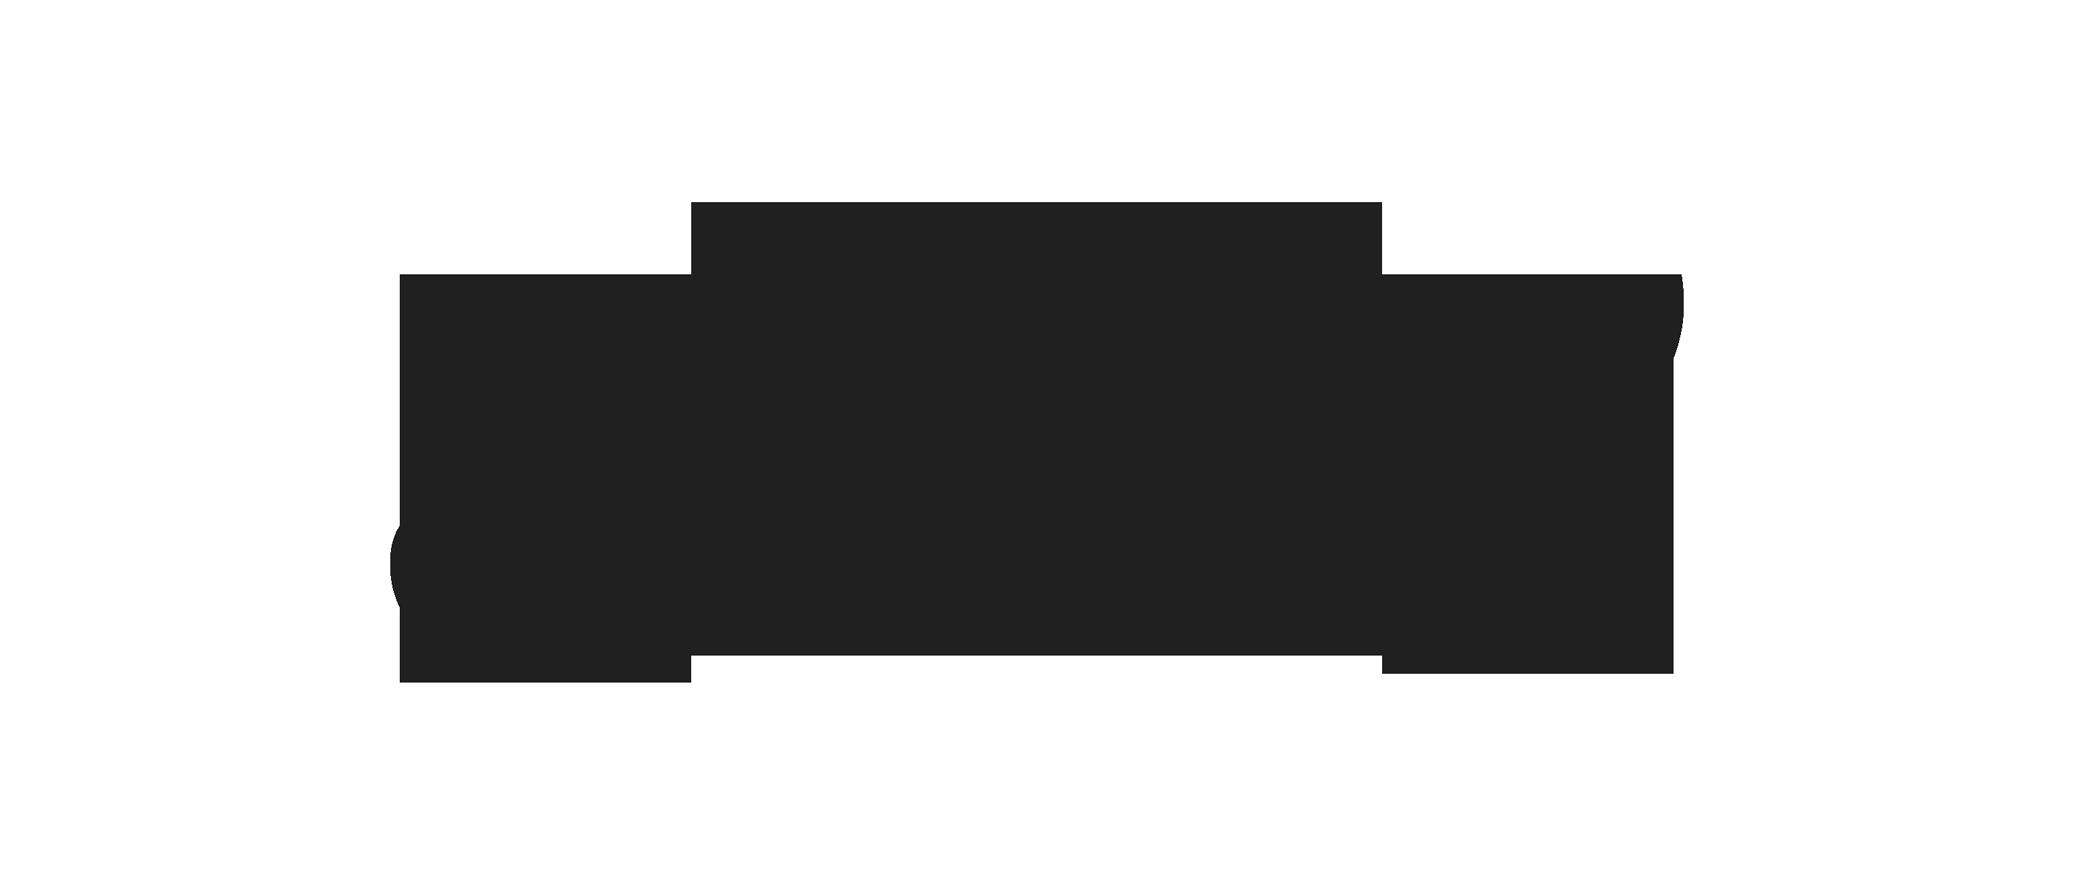 Vulf Mono – Font Review Journal